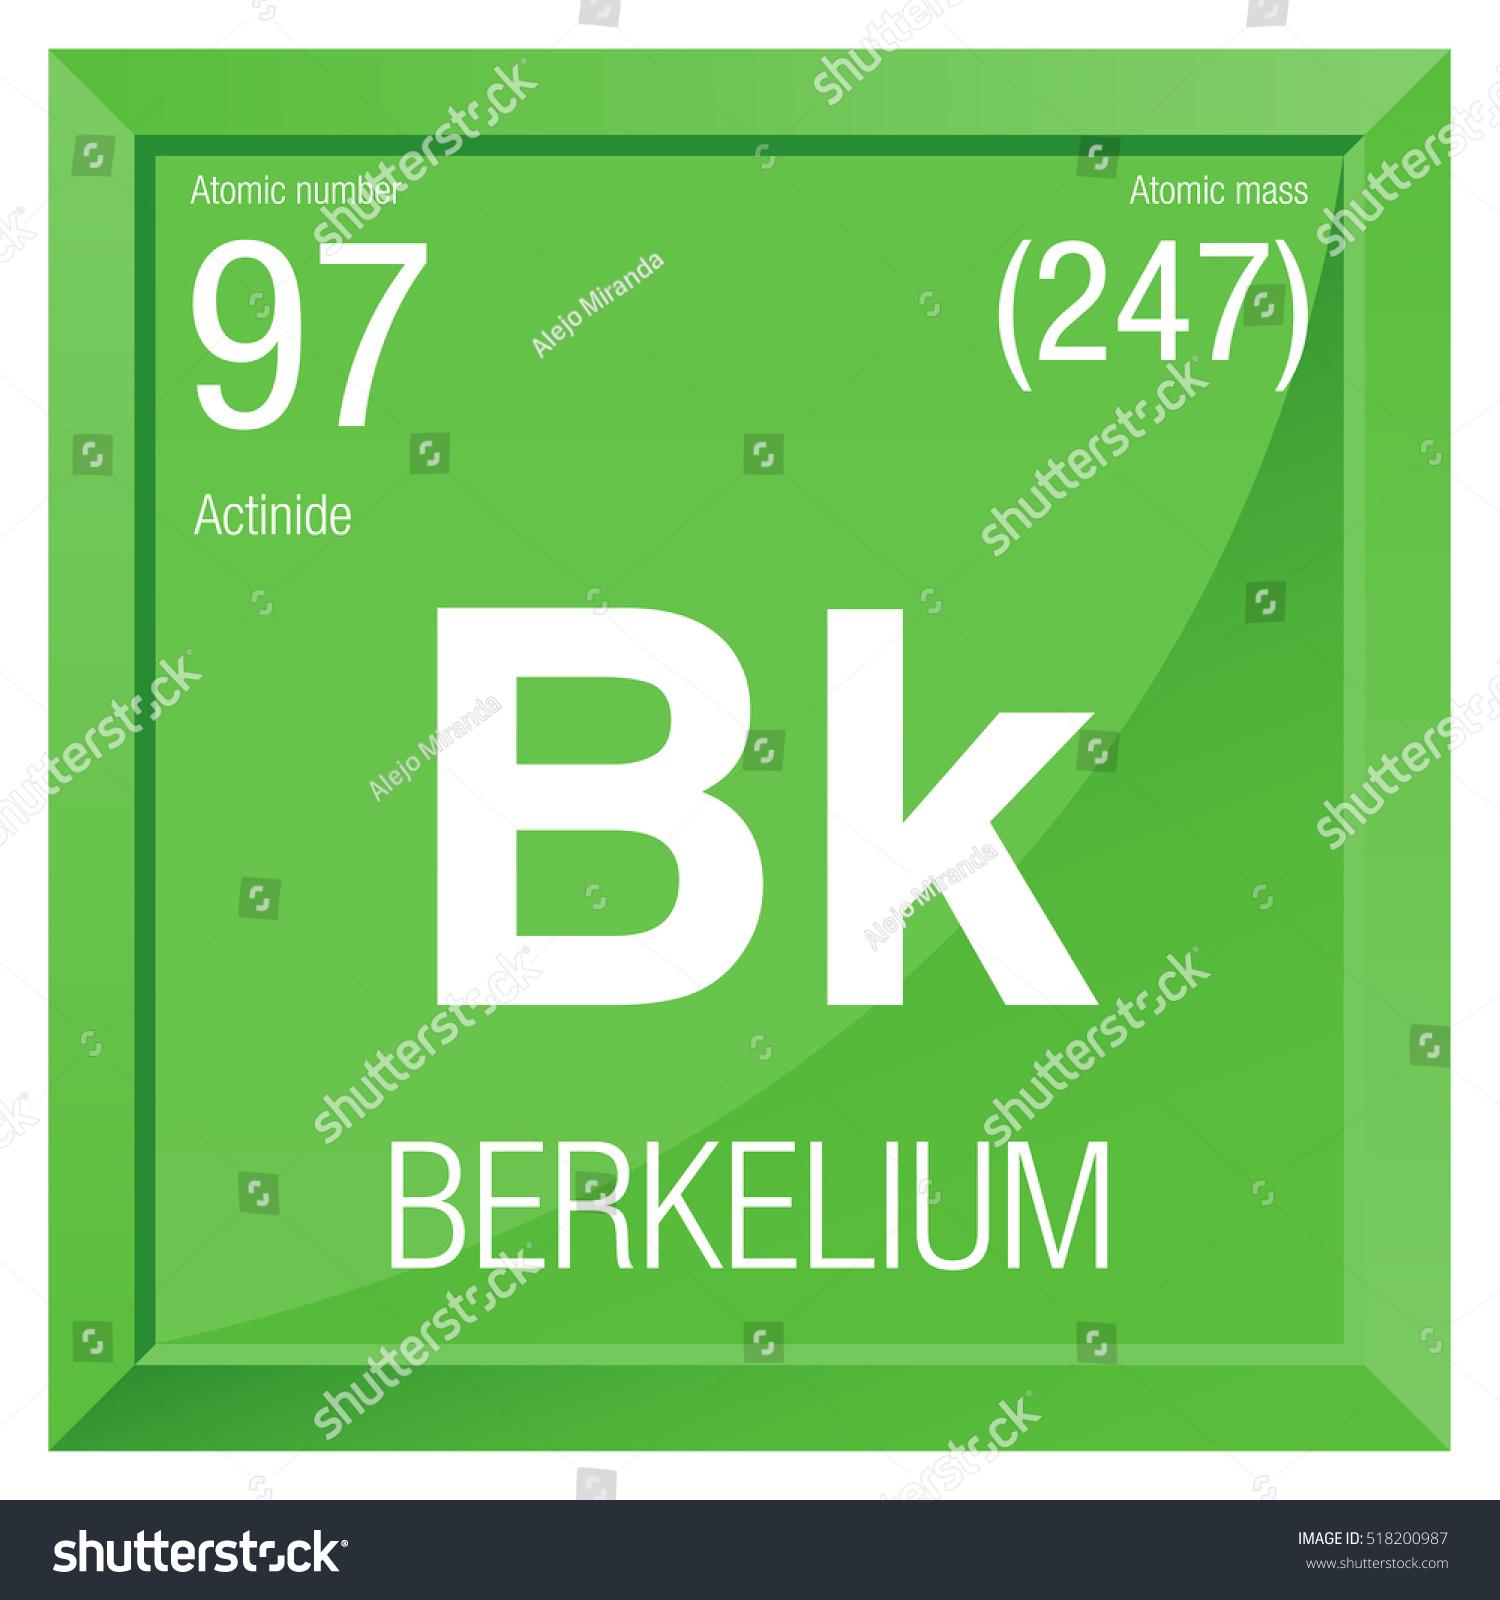 Berkelium symbol element number 97 periodic stock vector 518200987 berkelium symbol element number 97 of the periodic table of the elements chemistry urtaz Choice Image